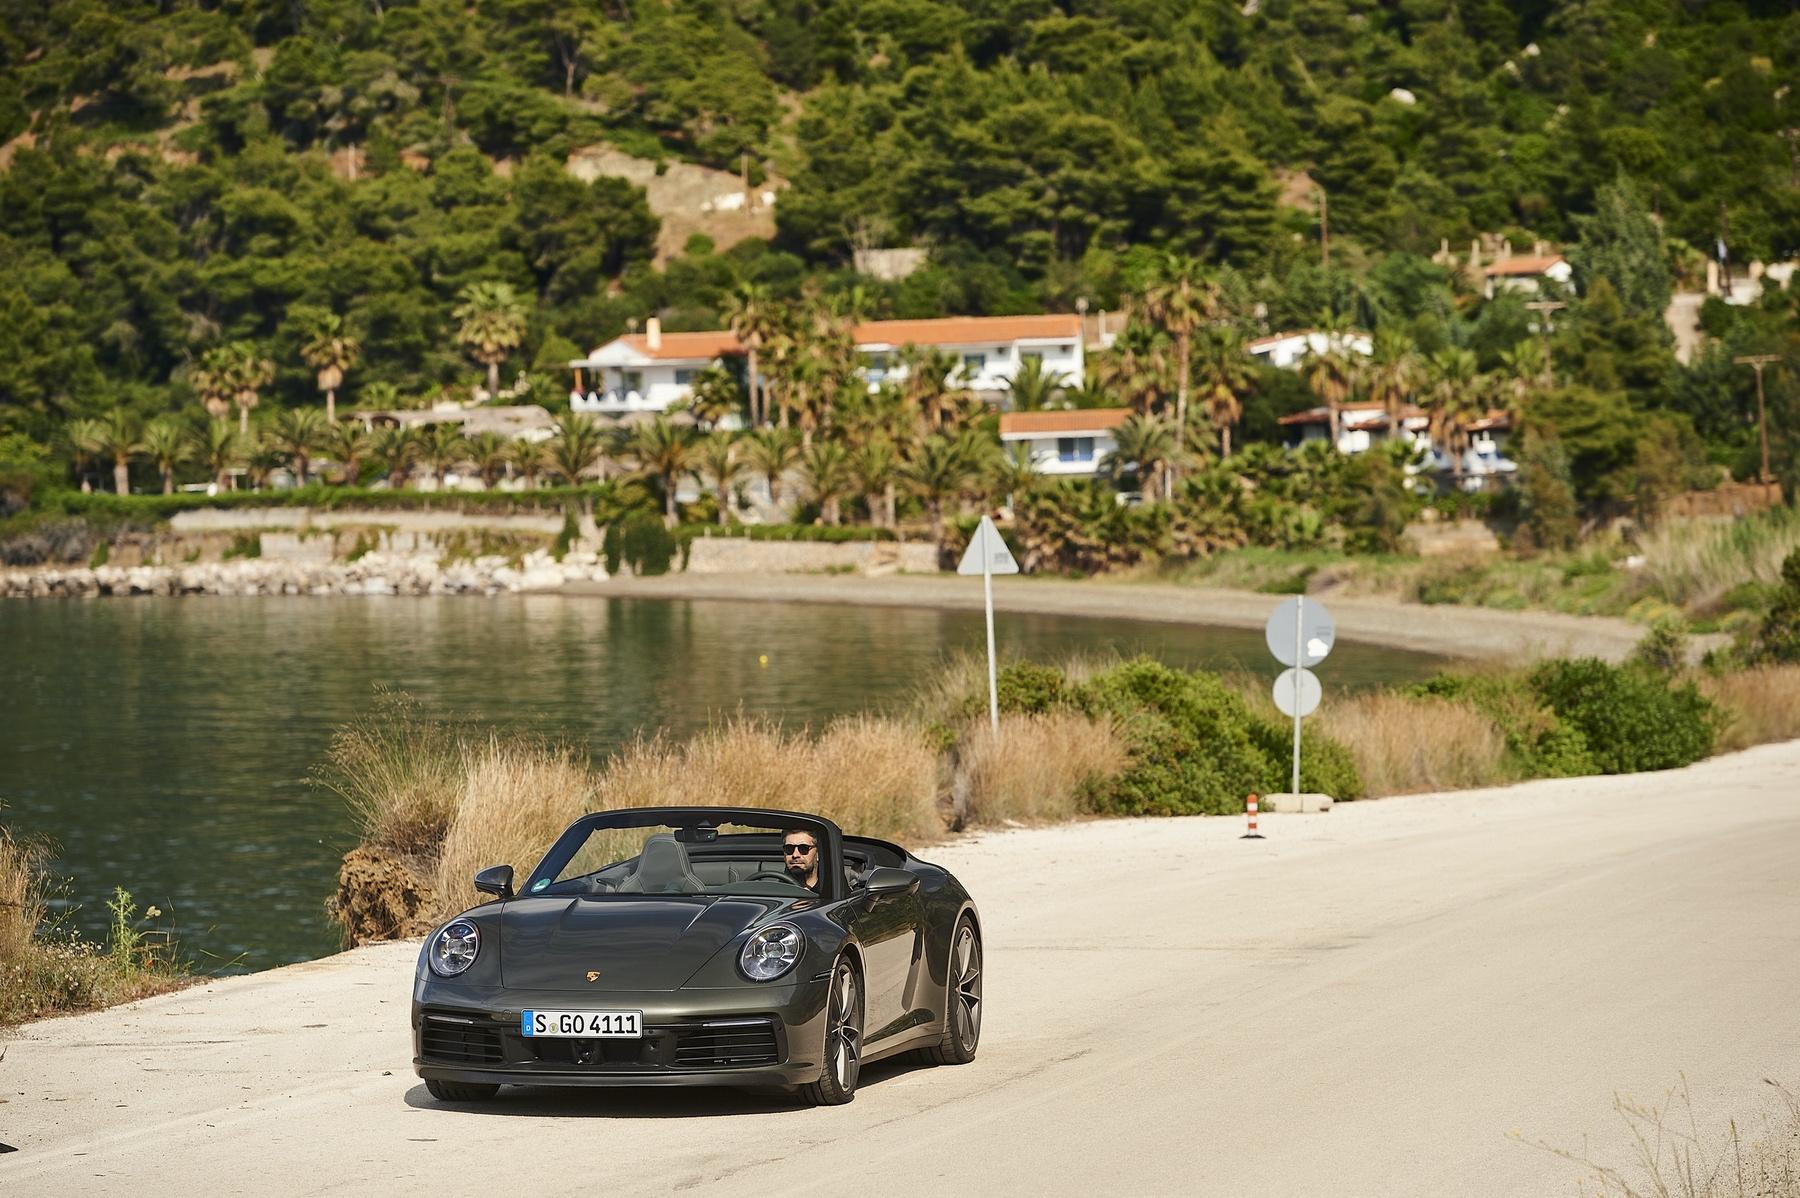 Test_Drive_Porsche_911_Athens_0037